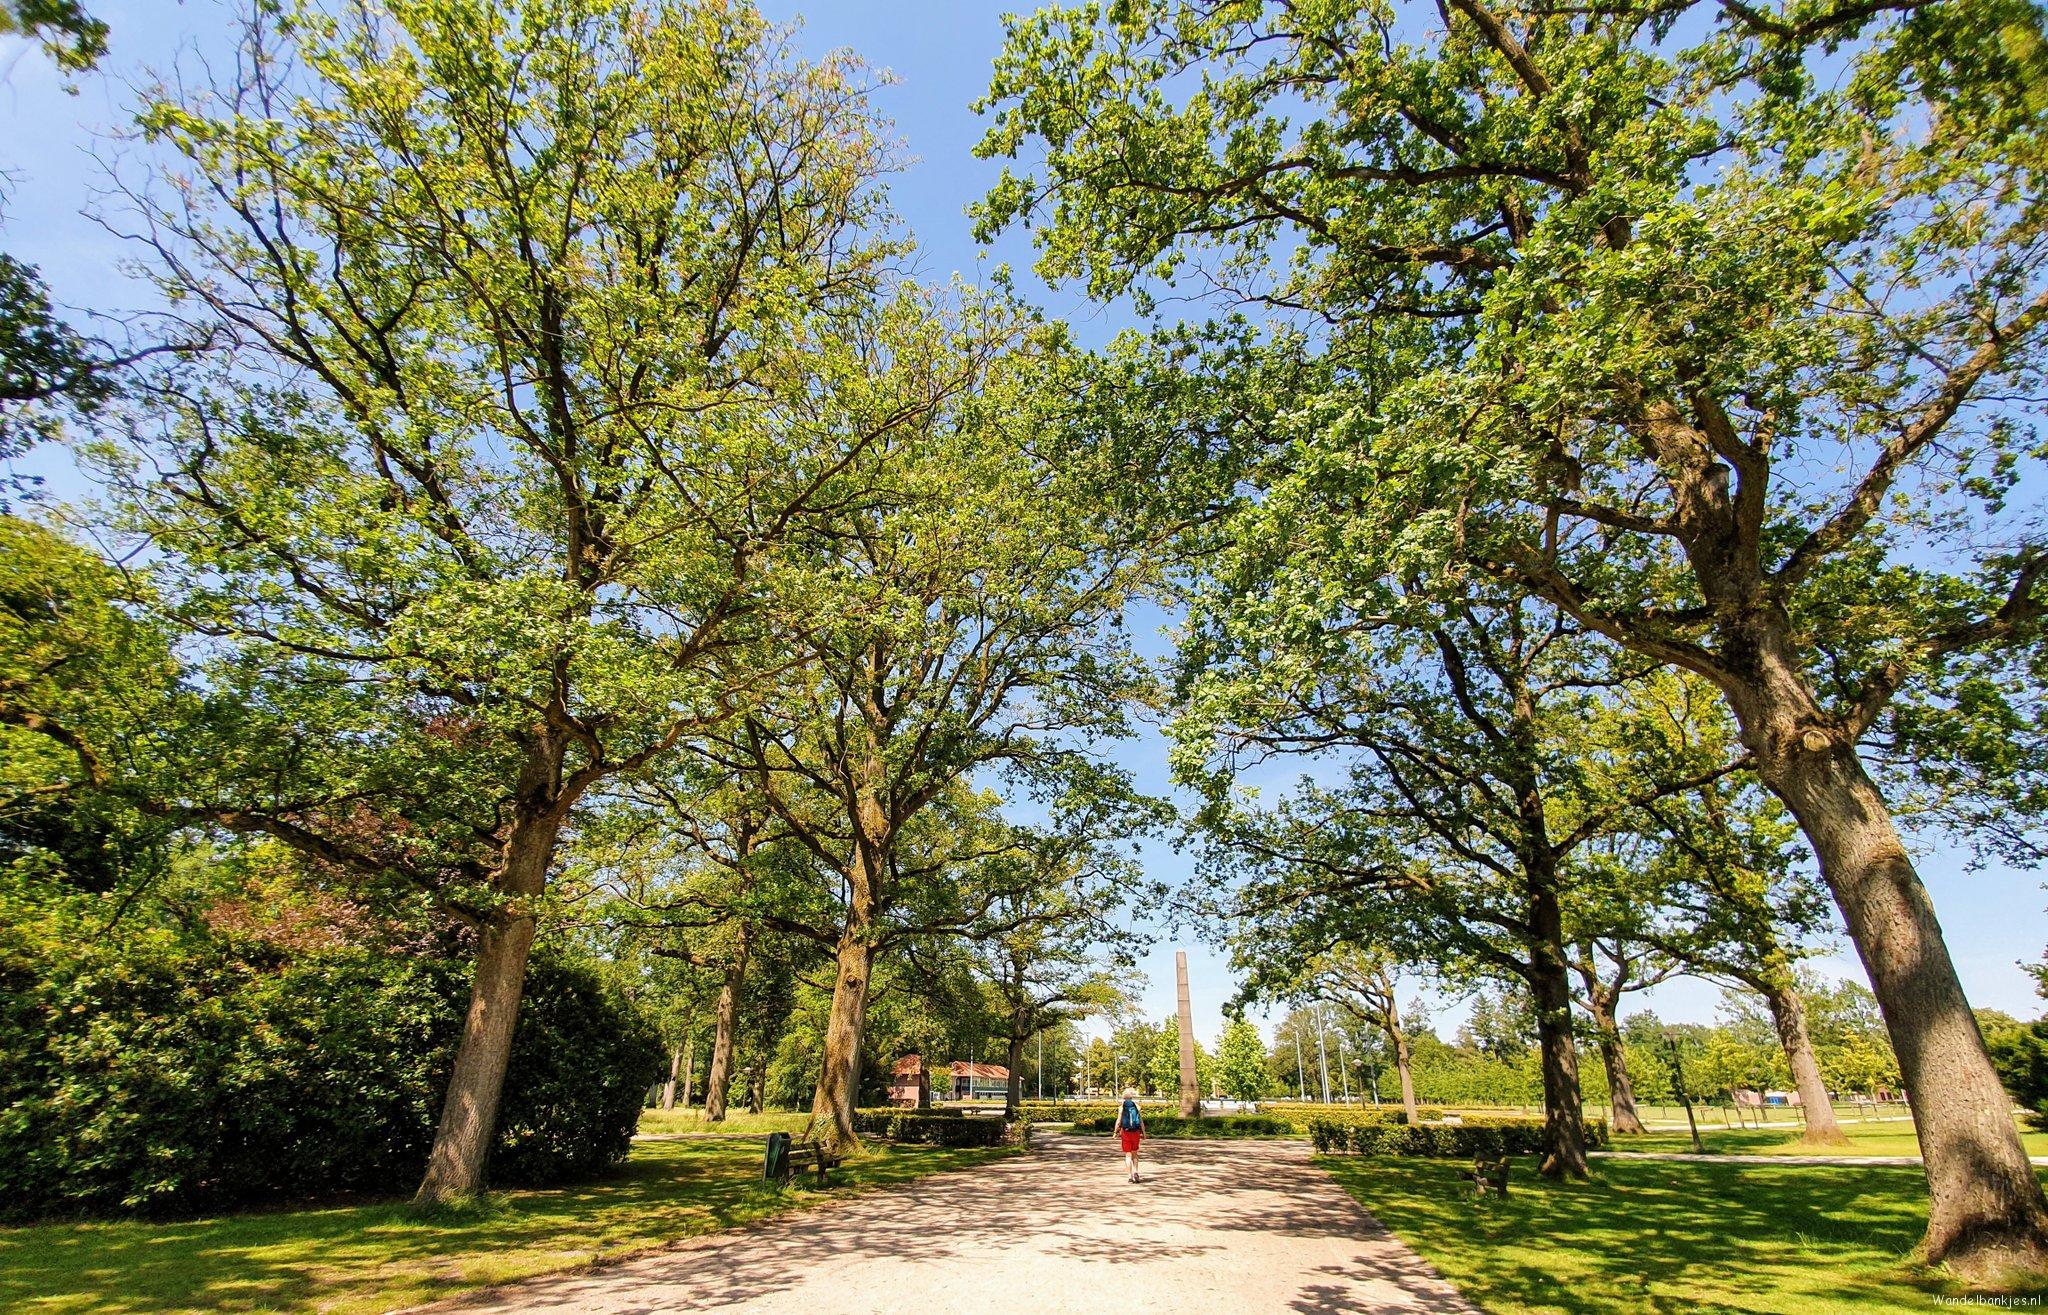 rt-wolfswandelplan-van-heekpark-in-enschede-wandelbankjes-https-t-co-ijavms5kdq